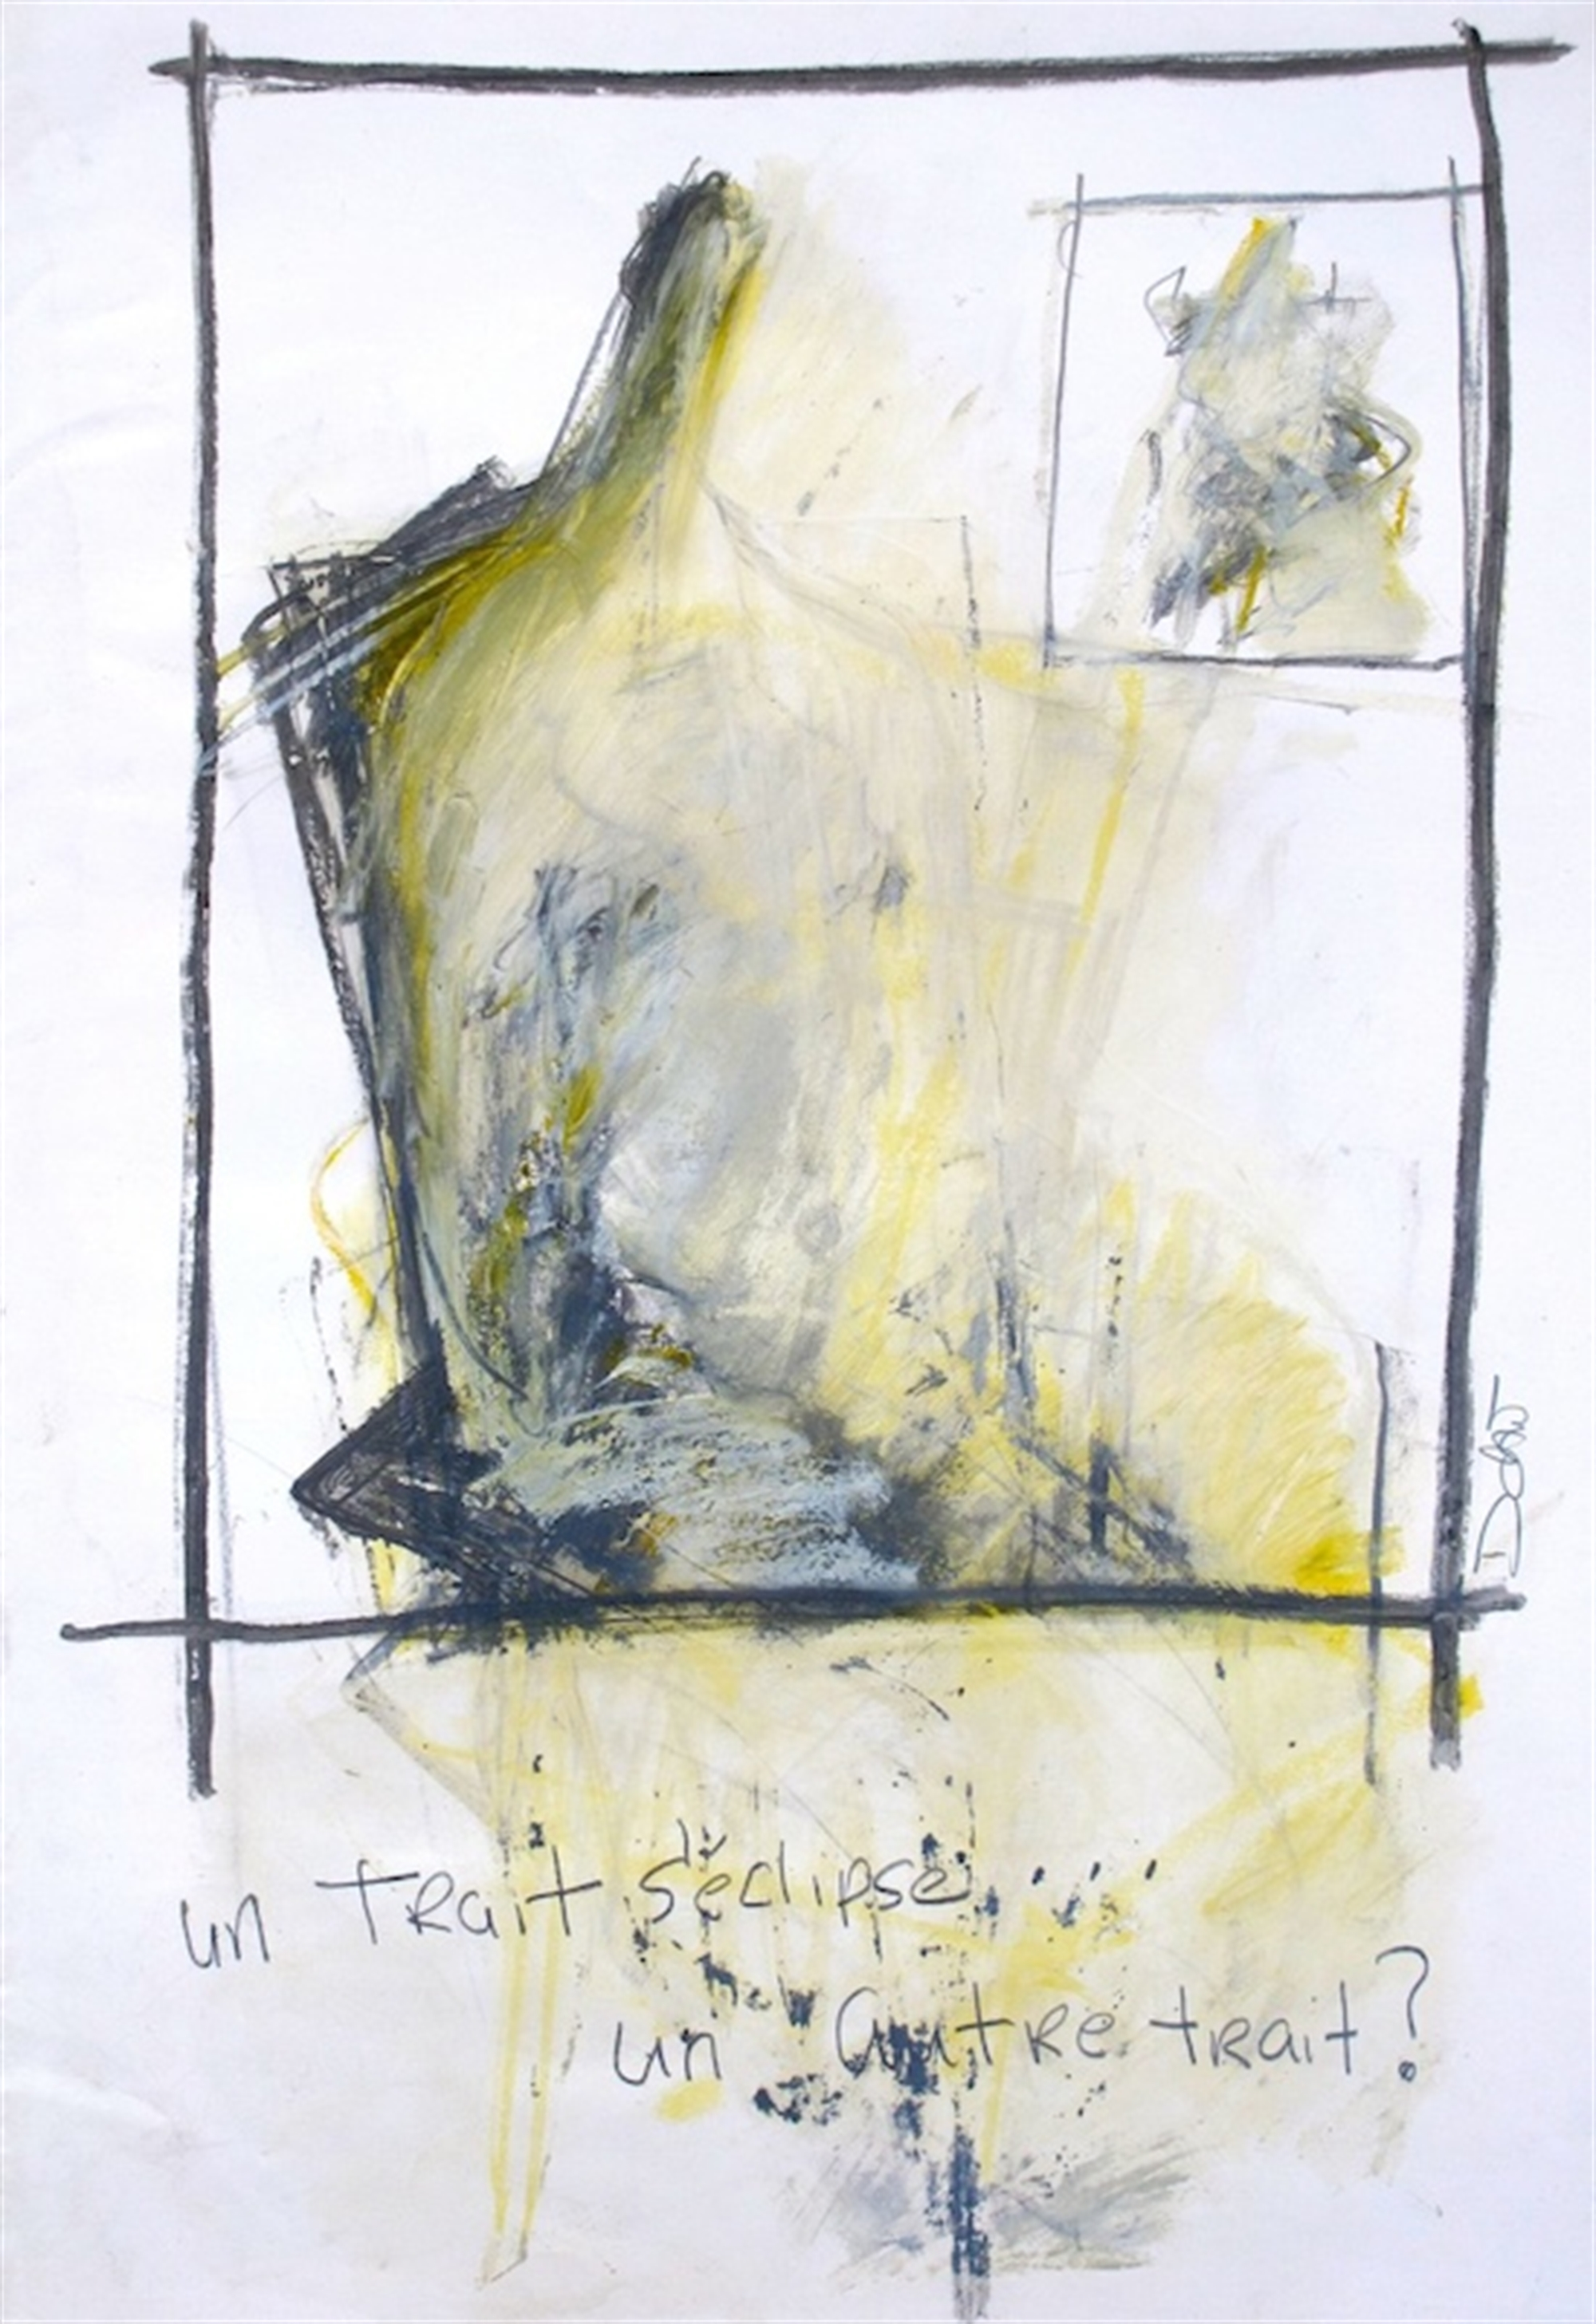 Un Trait Seclipse by Chrissy Dolan-Terrasi